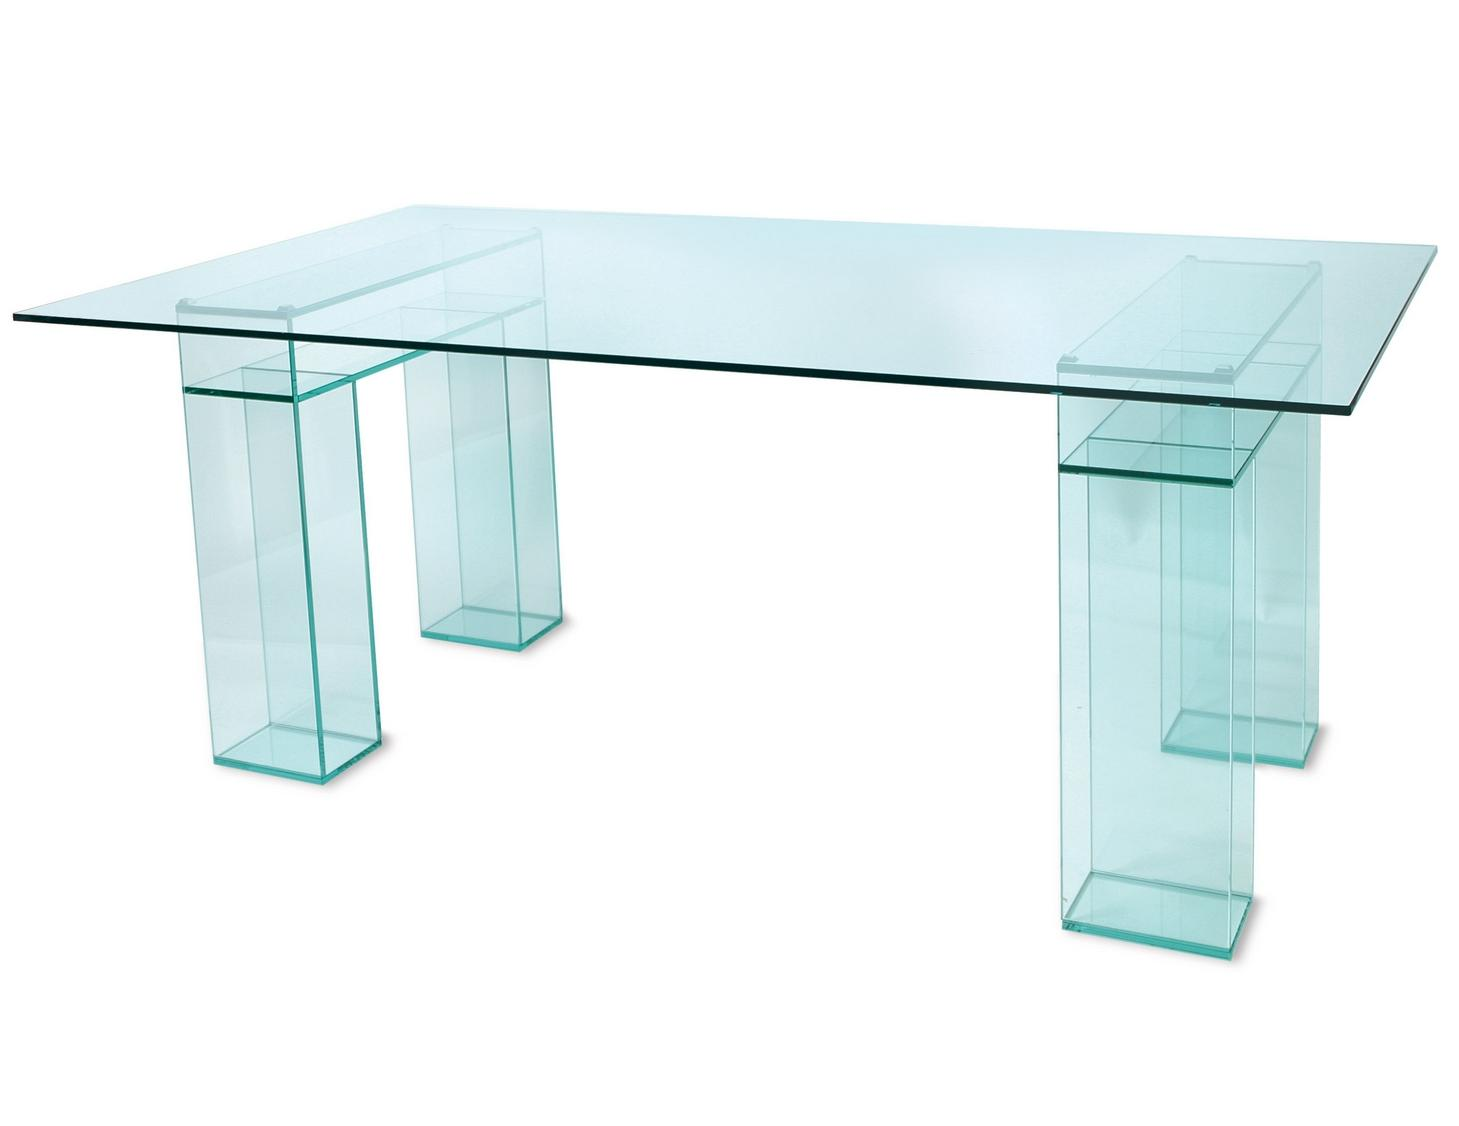 #17594D22240060 Glzaen Meubel Temp Foto Dutch Glass Design betrouwbaar Design Glazen Tv Meubels 1147 afbeelding opslaan 145911261147 Idee